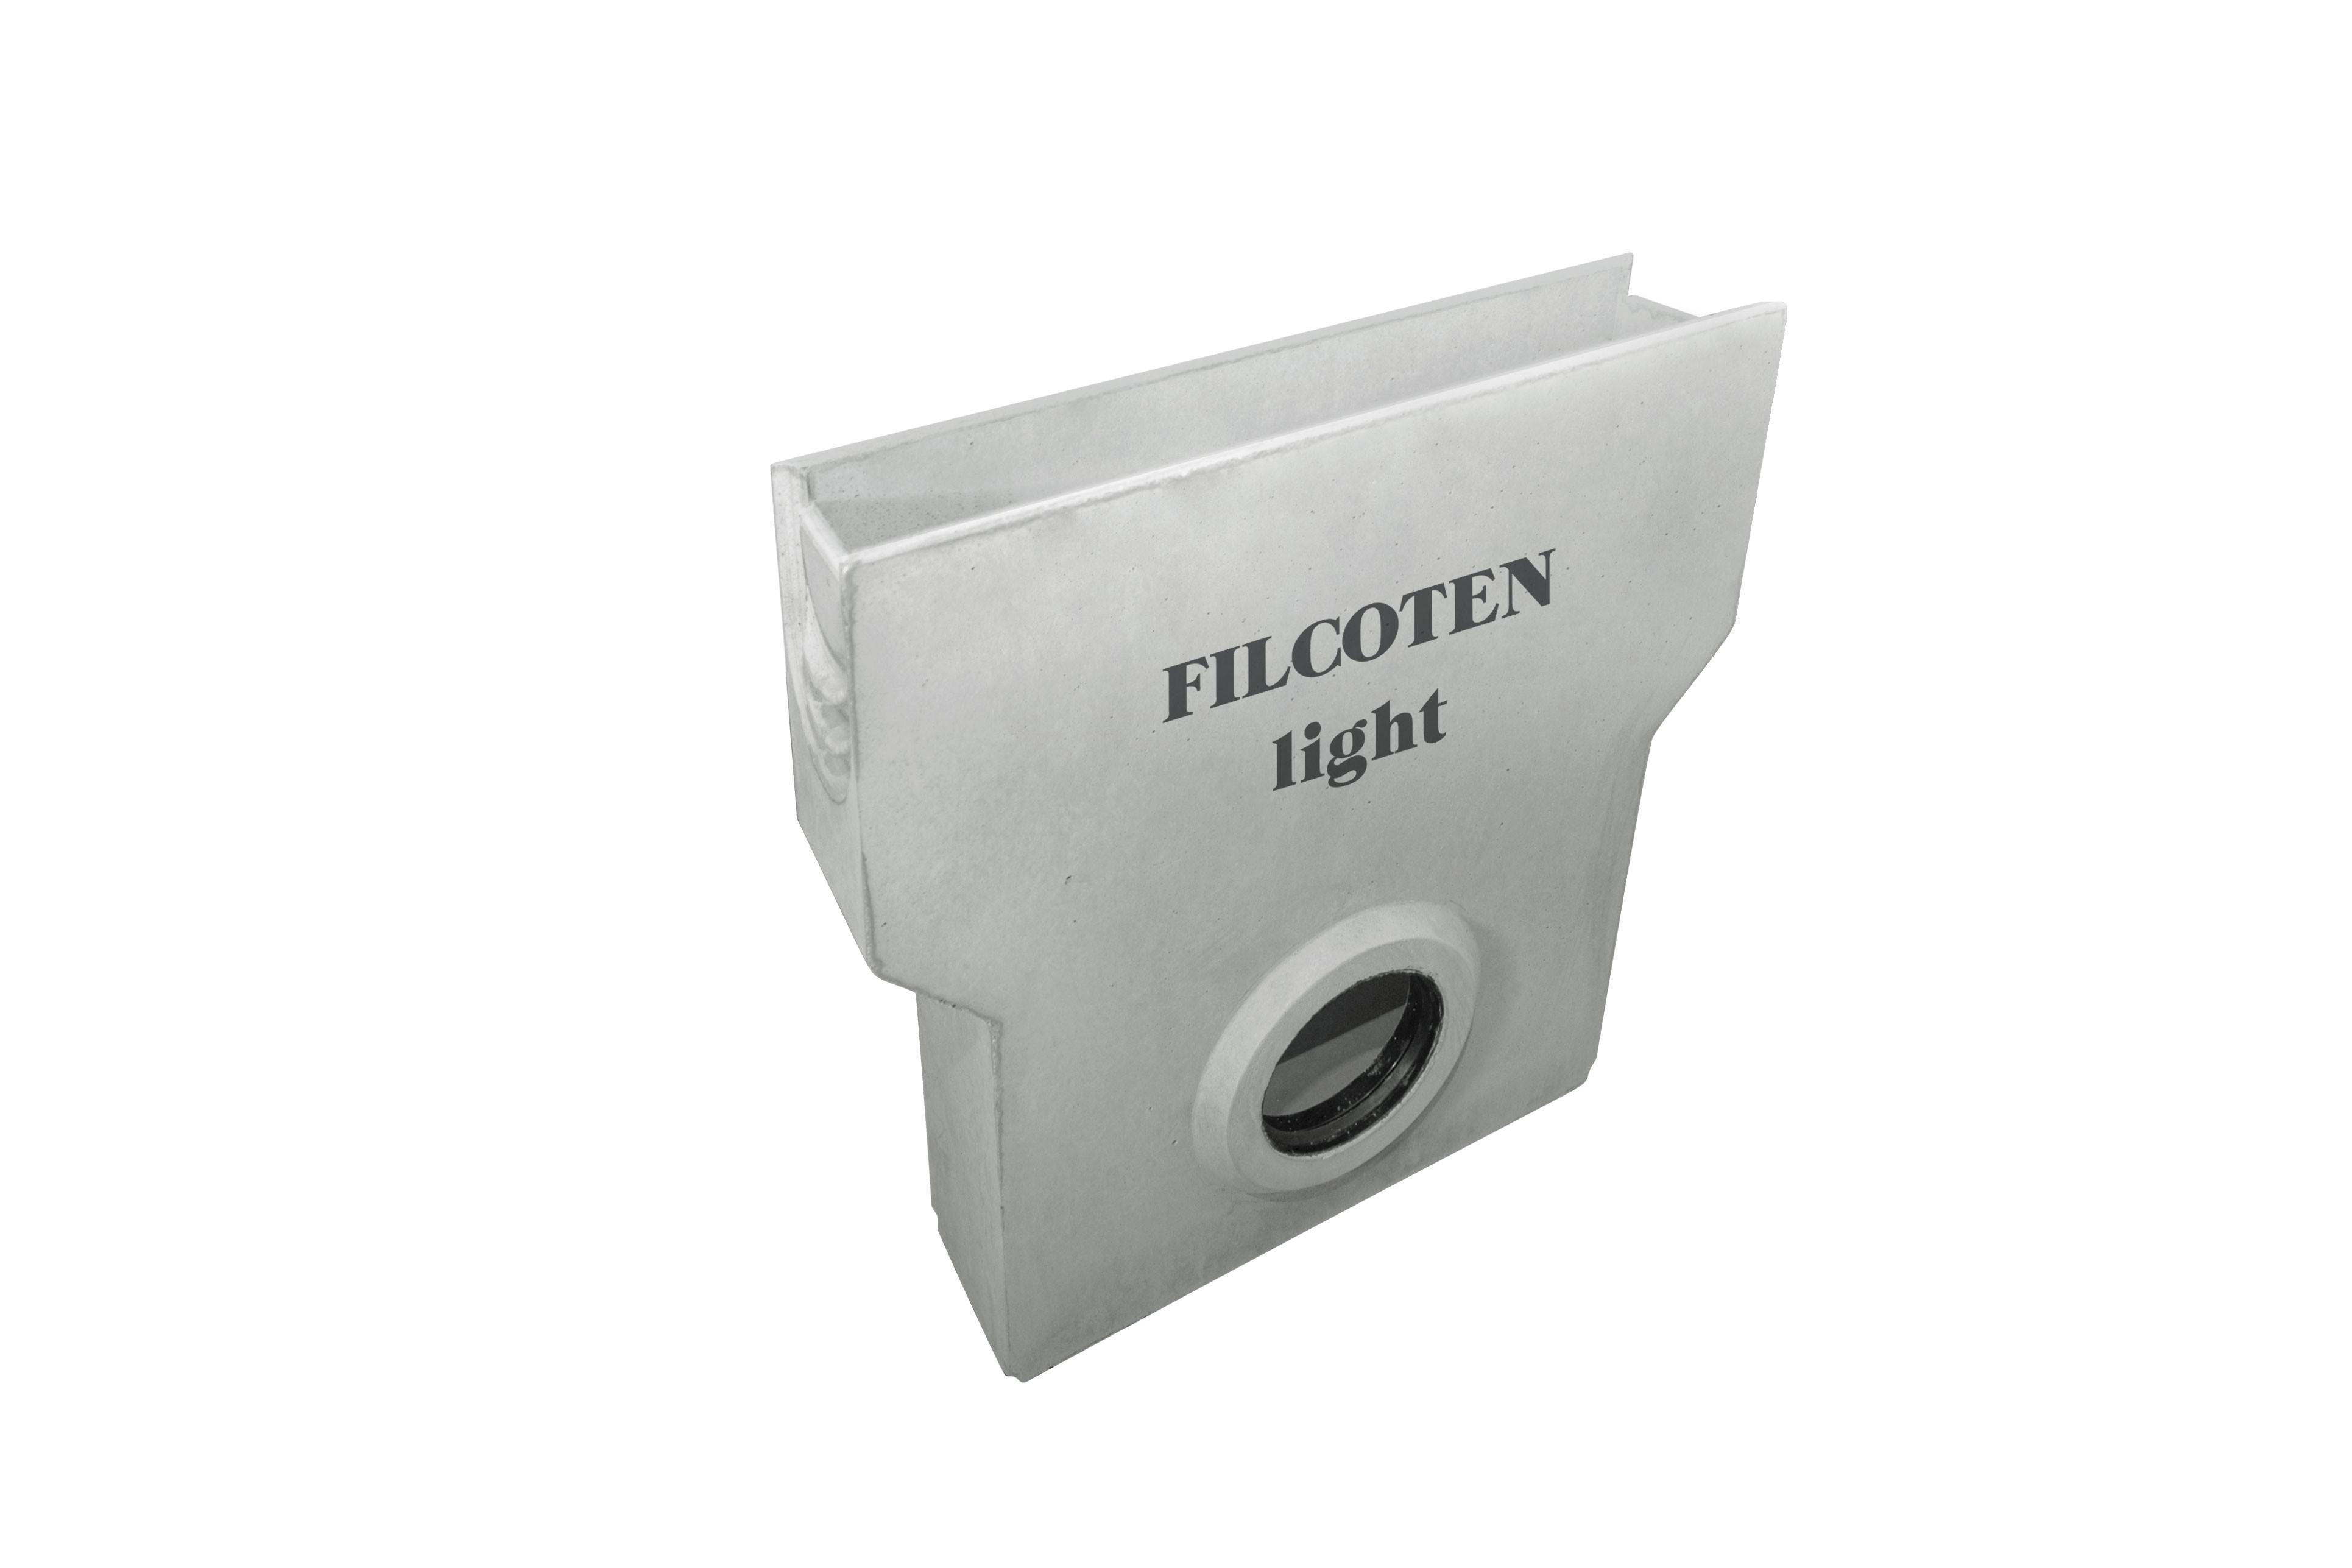 Шахта Filcoten light 100/150